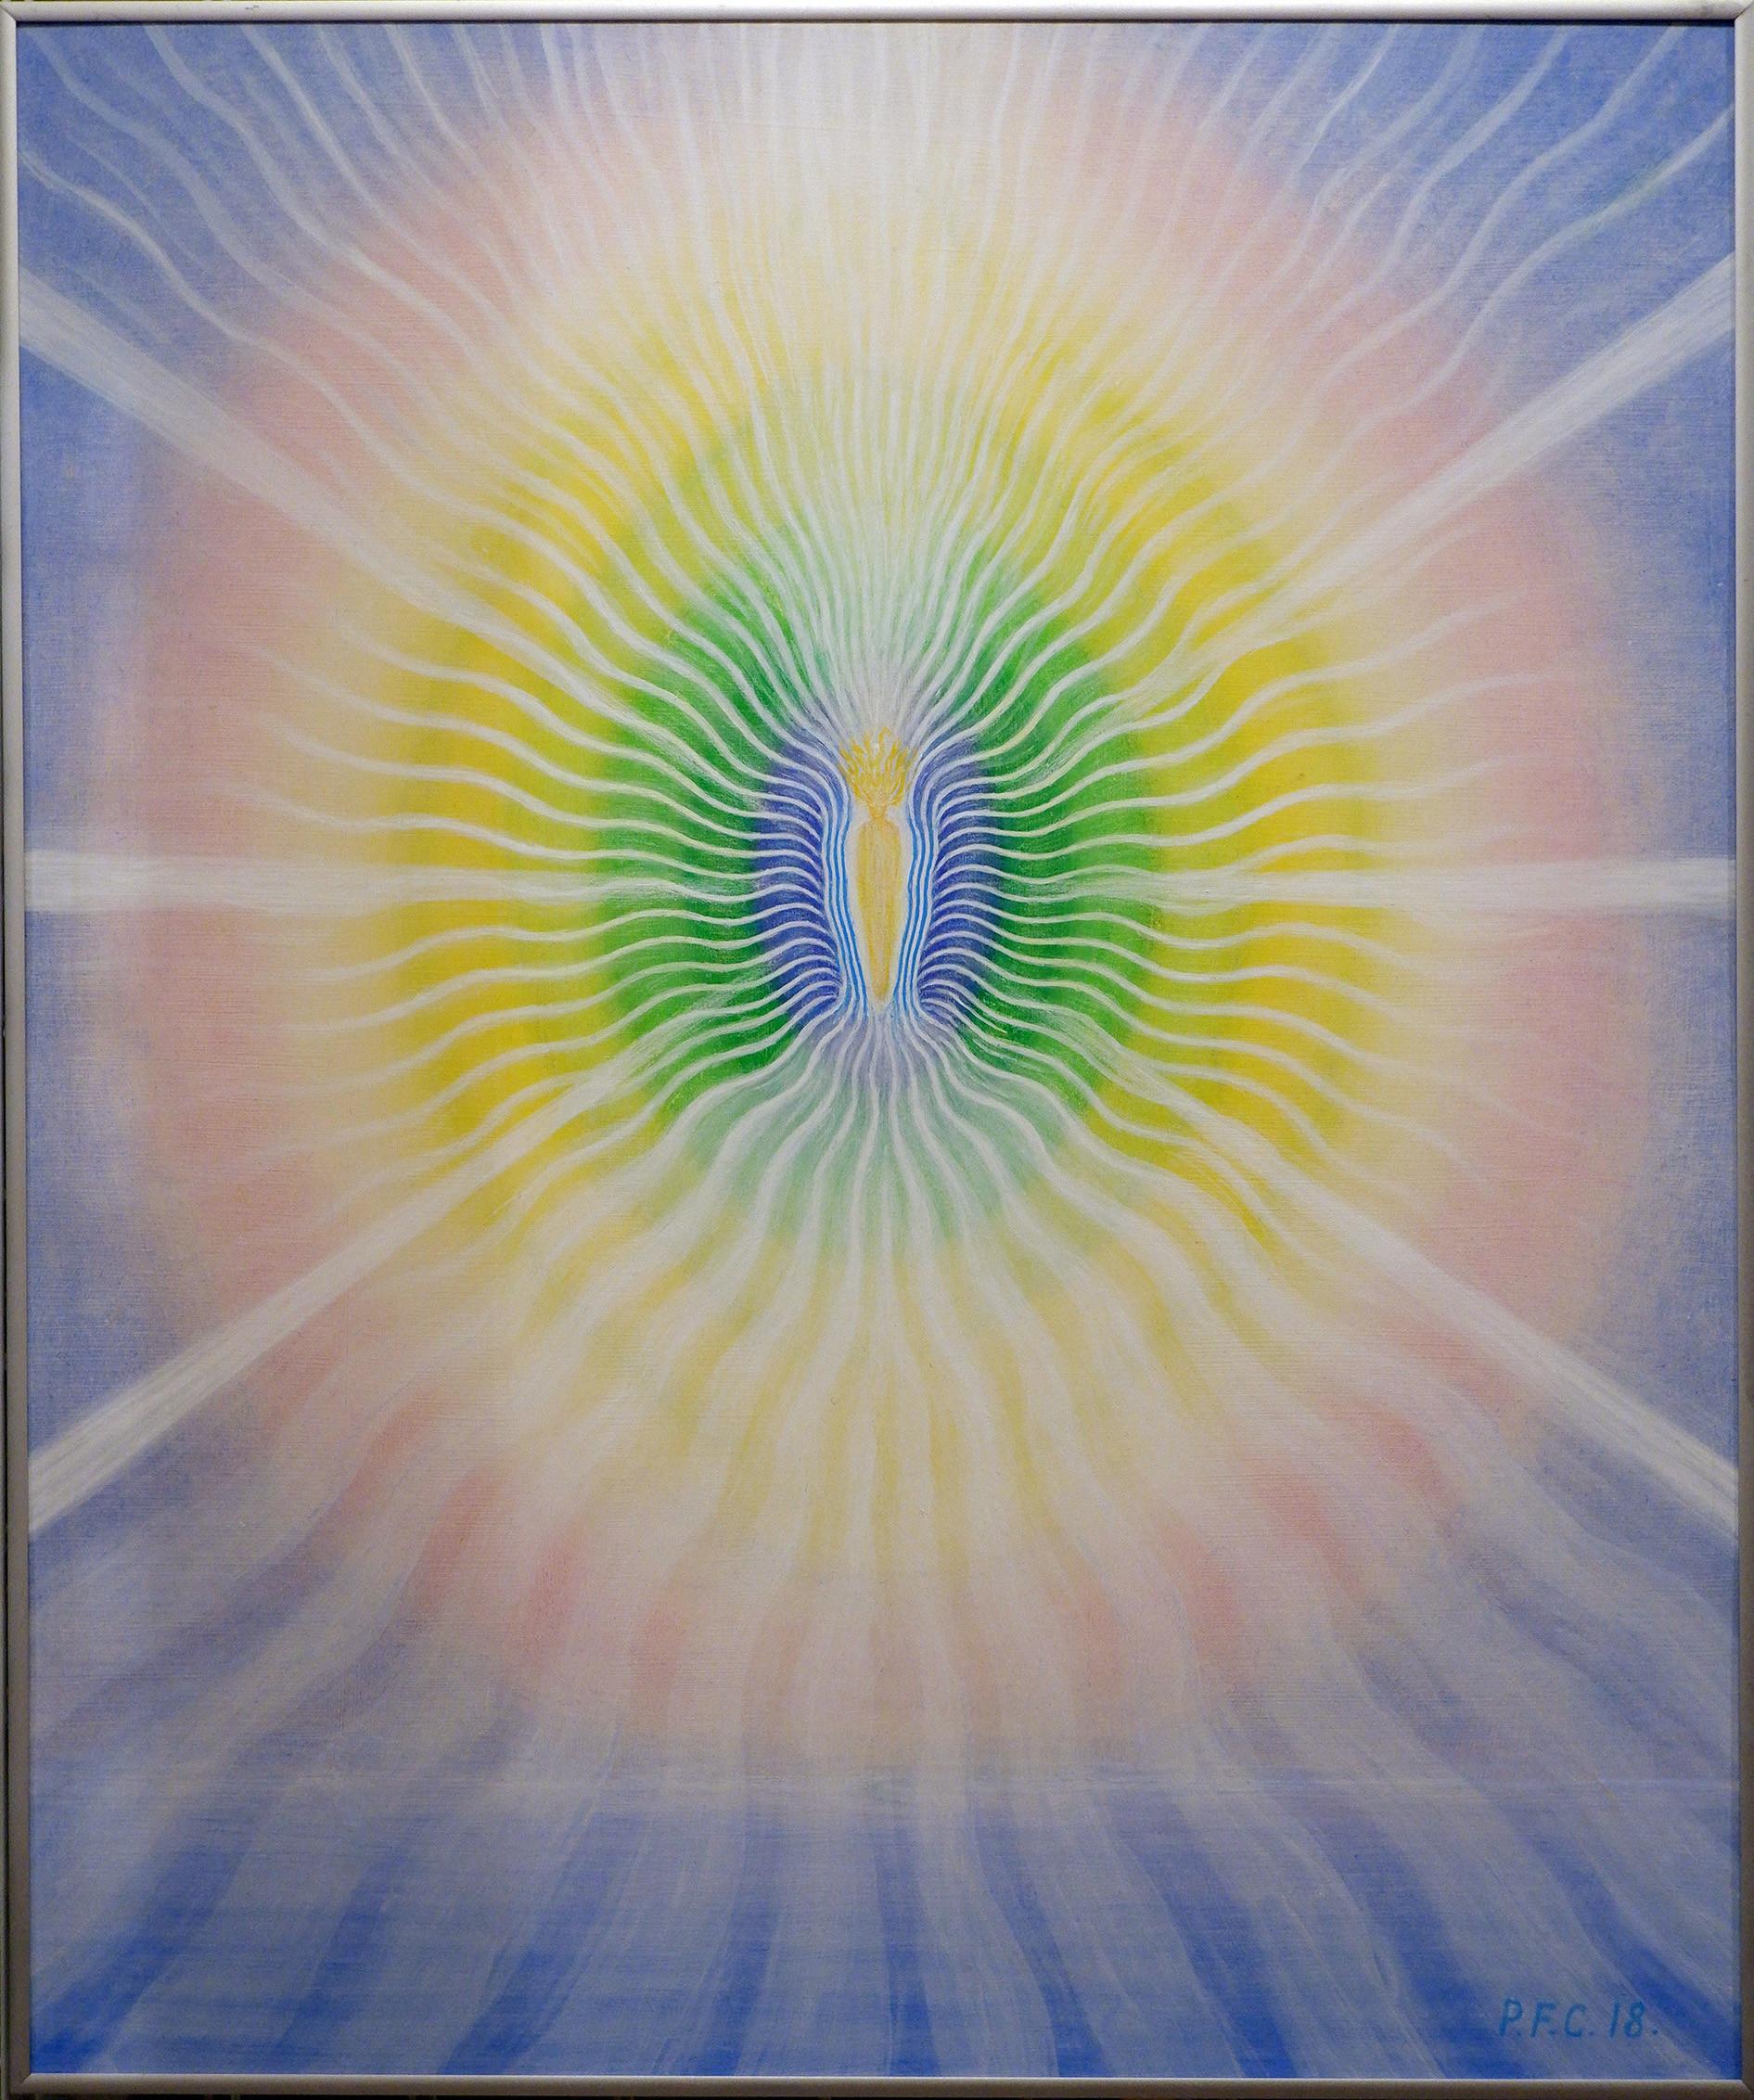 Peter Fich Christiansen Sol-udstrømninger, 2018 Acrylic on masonite 71 x 50 cm